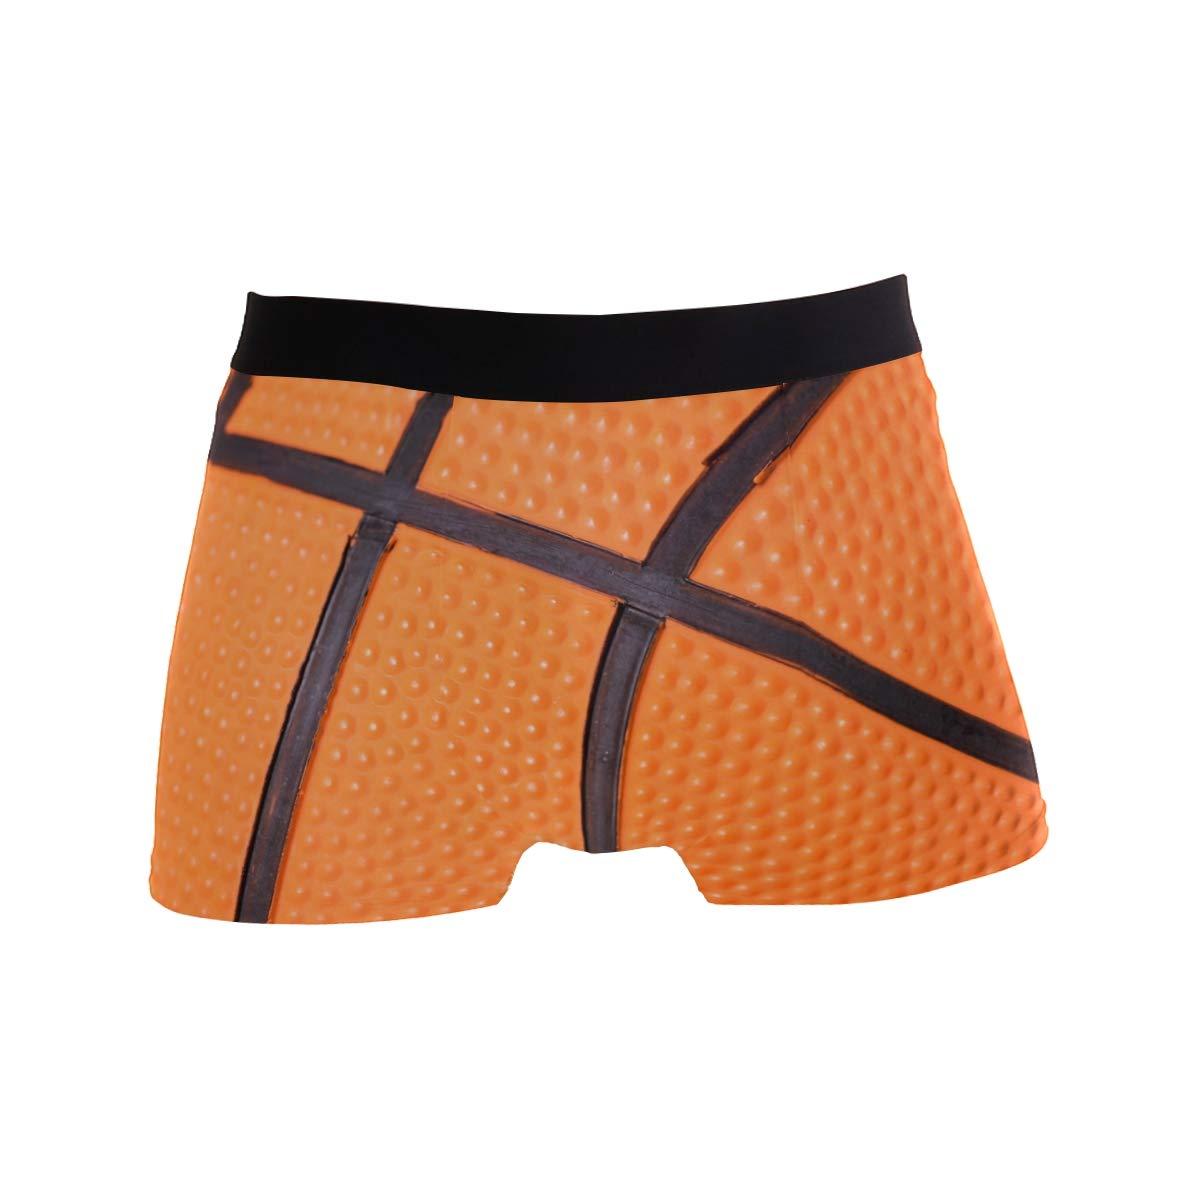 BETTKEN Mens Boxer Briefs Basketball Texture Print Short Underwear Soft Stretch Underpants for Men Boys S-XL